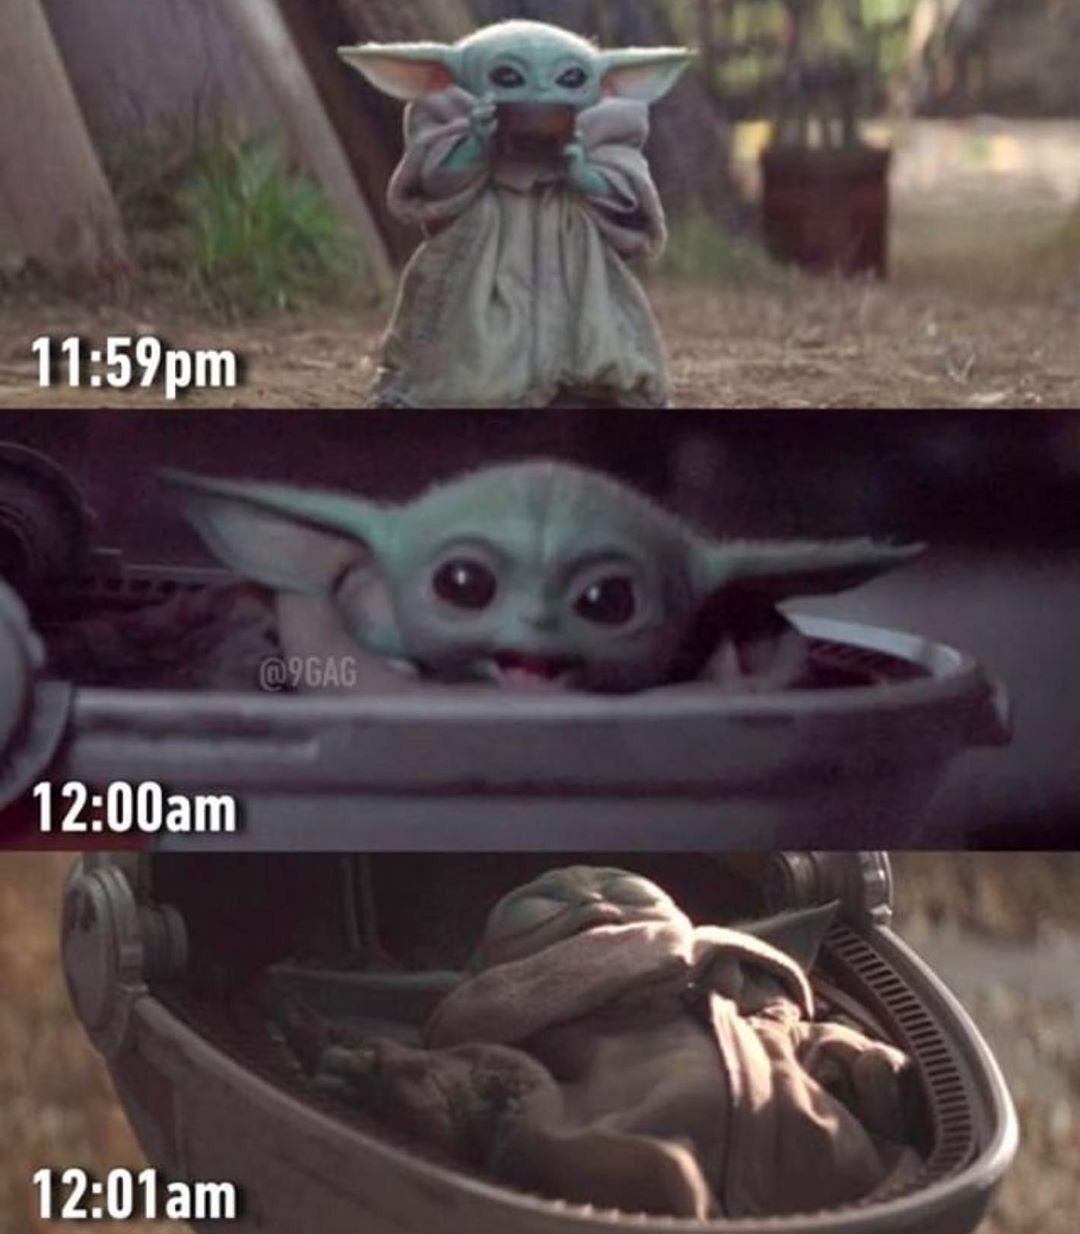 Happy New Years Hope Everyone Is Having Fun And Partying It Up Tonight Baby Yoda Style Yoda Meme Happy New Year Baby Yoda Funny